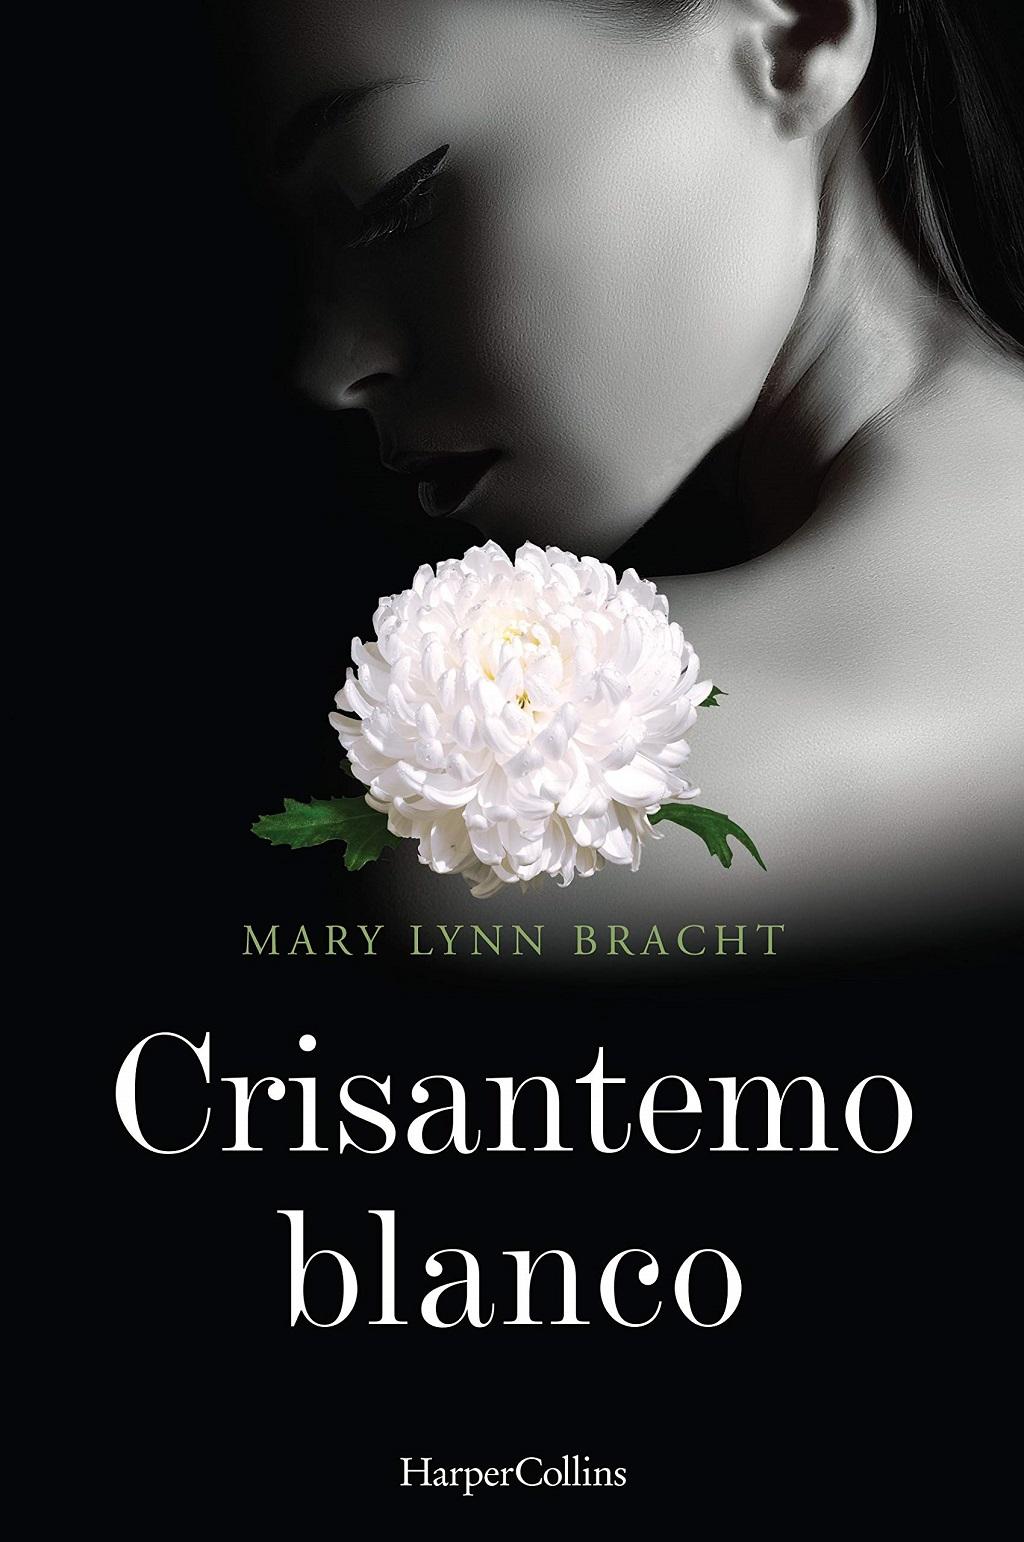 crisantemo blanco Mary Lynn Bracht